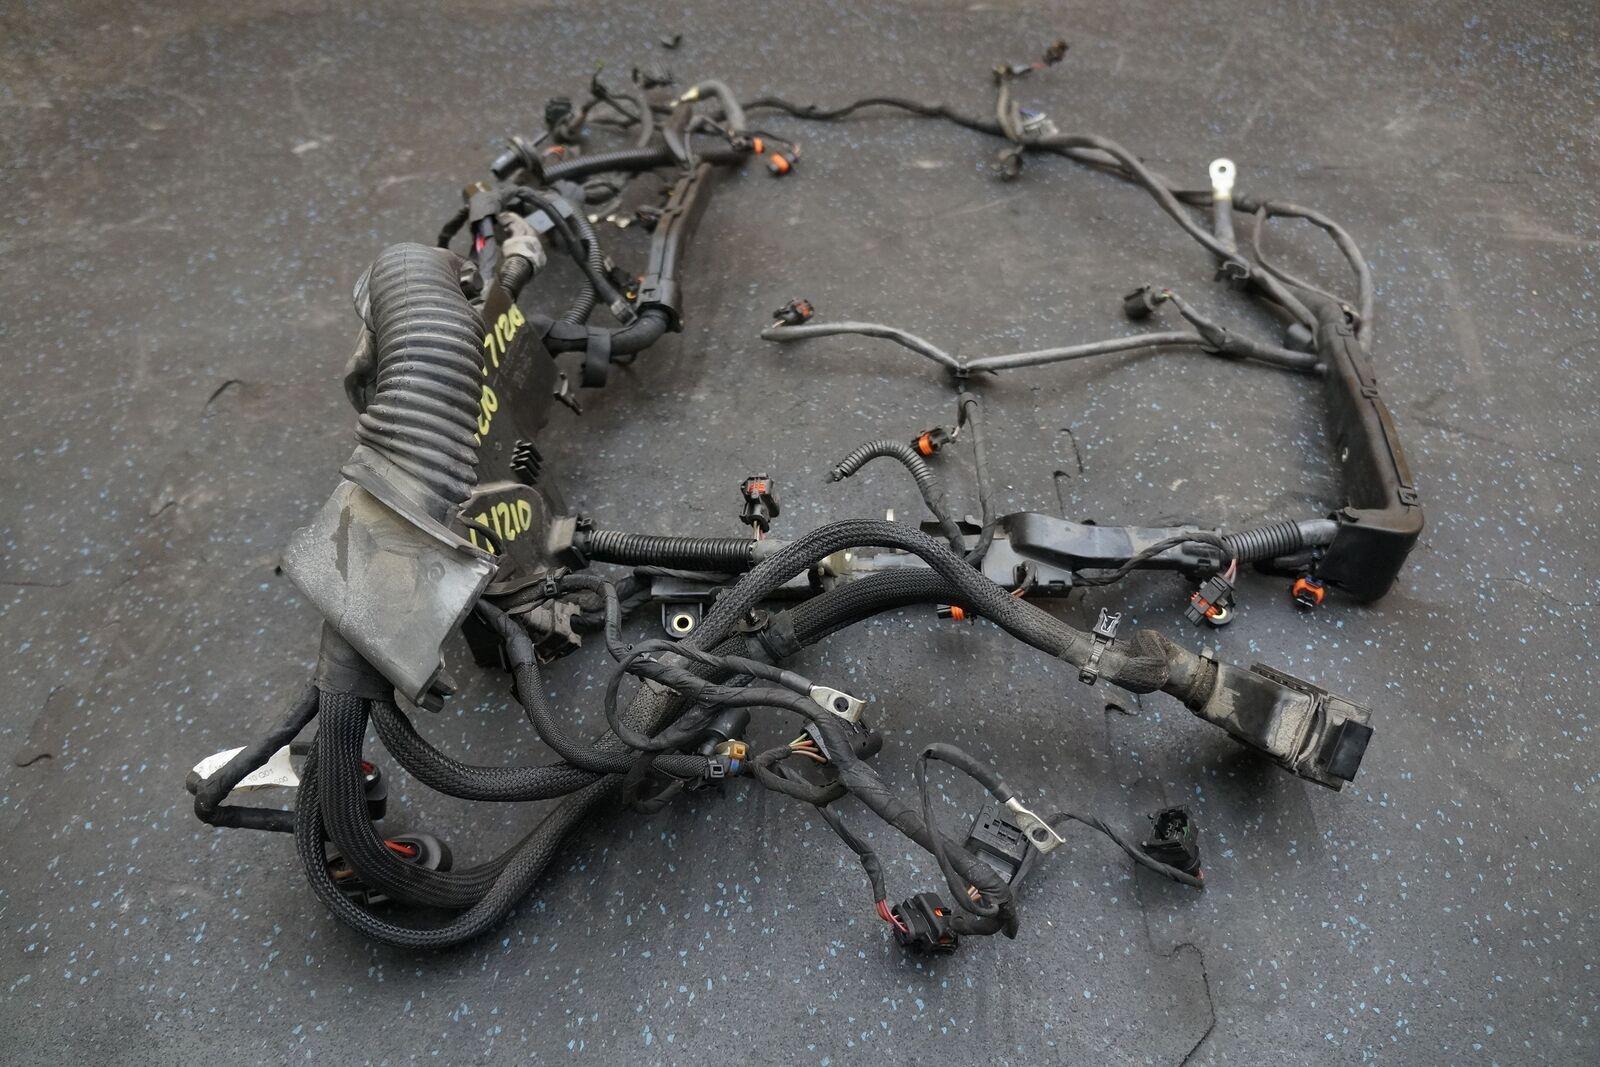 350 Rocket Engine Diagram Schematic Diagrams Wiring Harness Wire 406 Stroker Oldsmobile Motor Oem